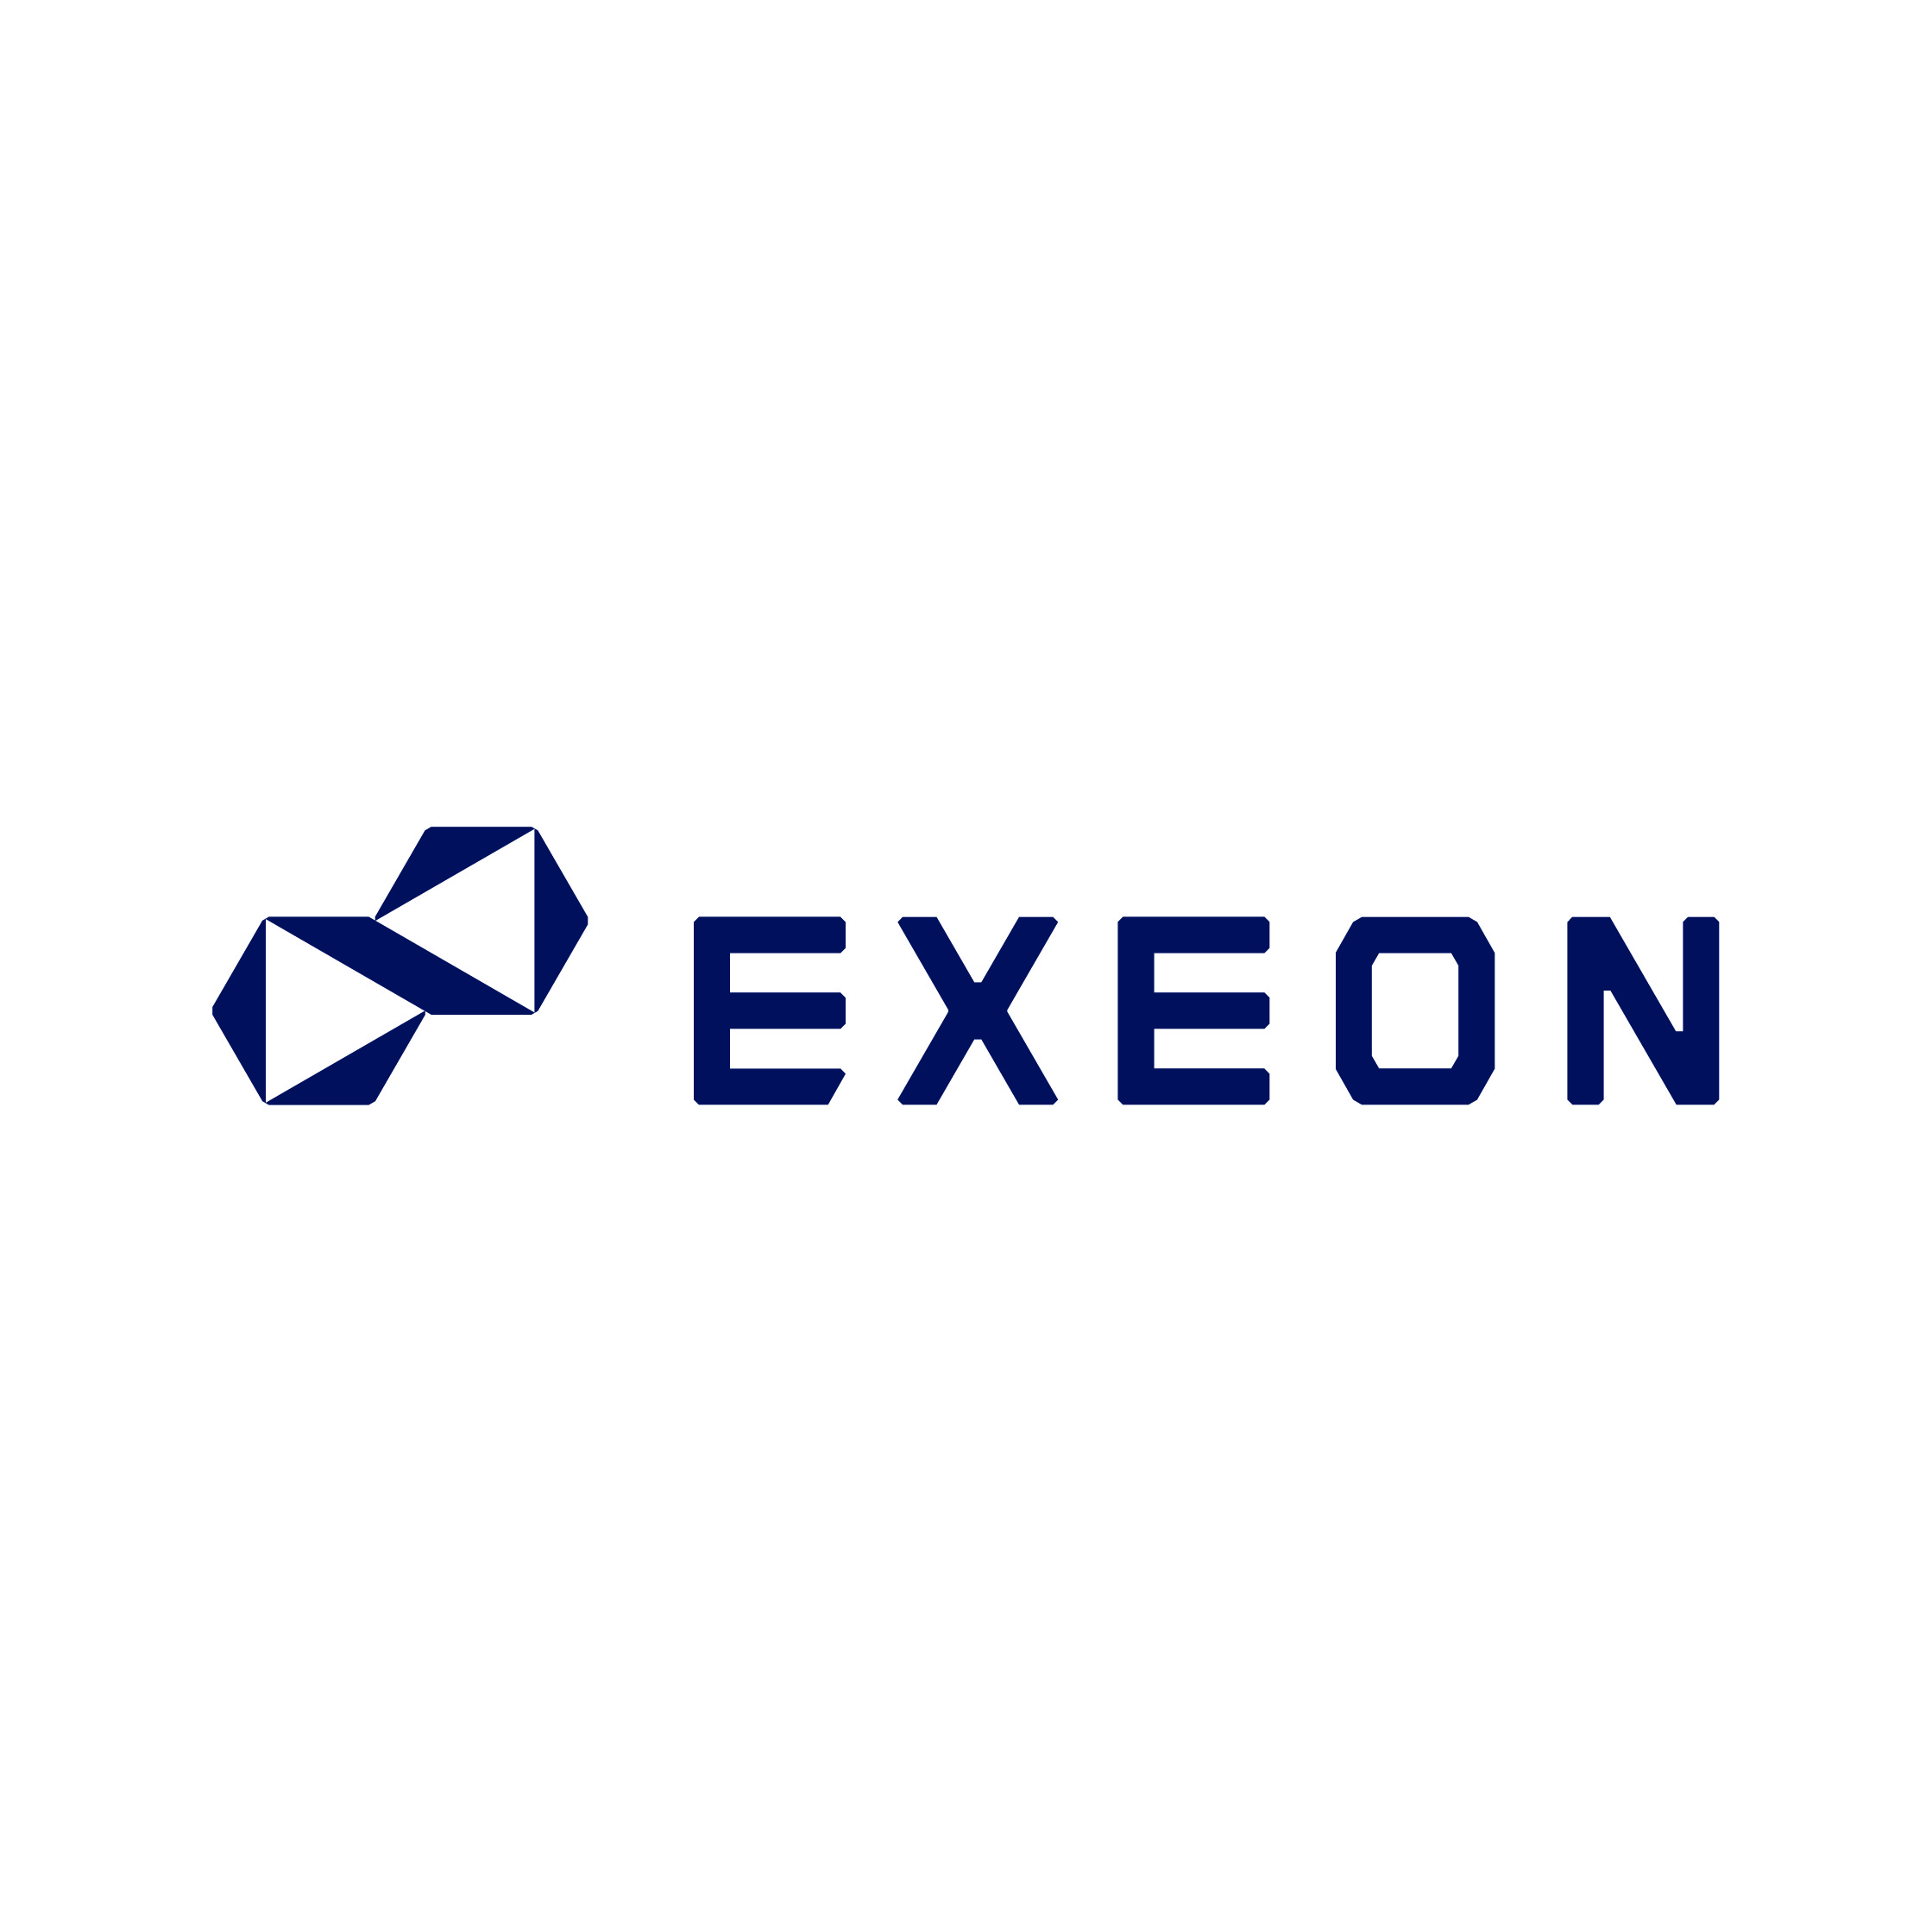 Exeon Sp. z o.o. s.k.